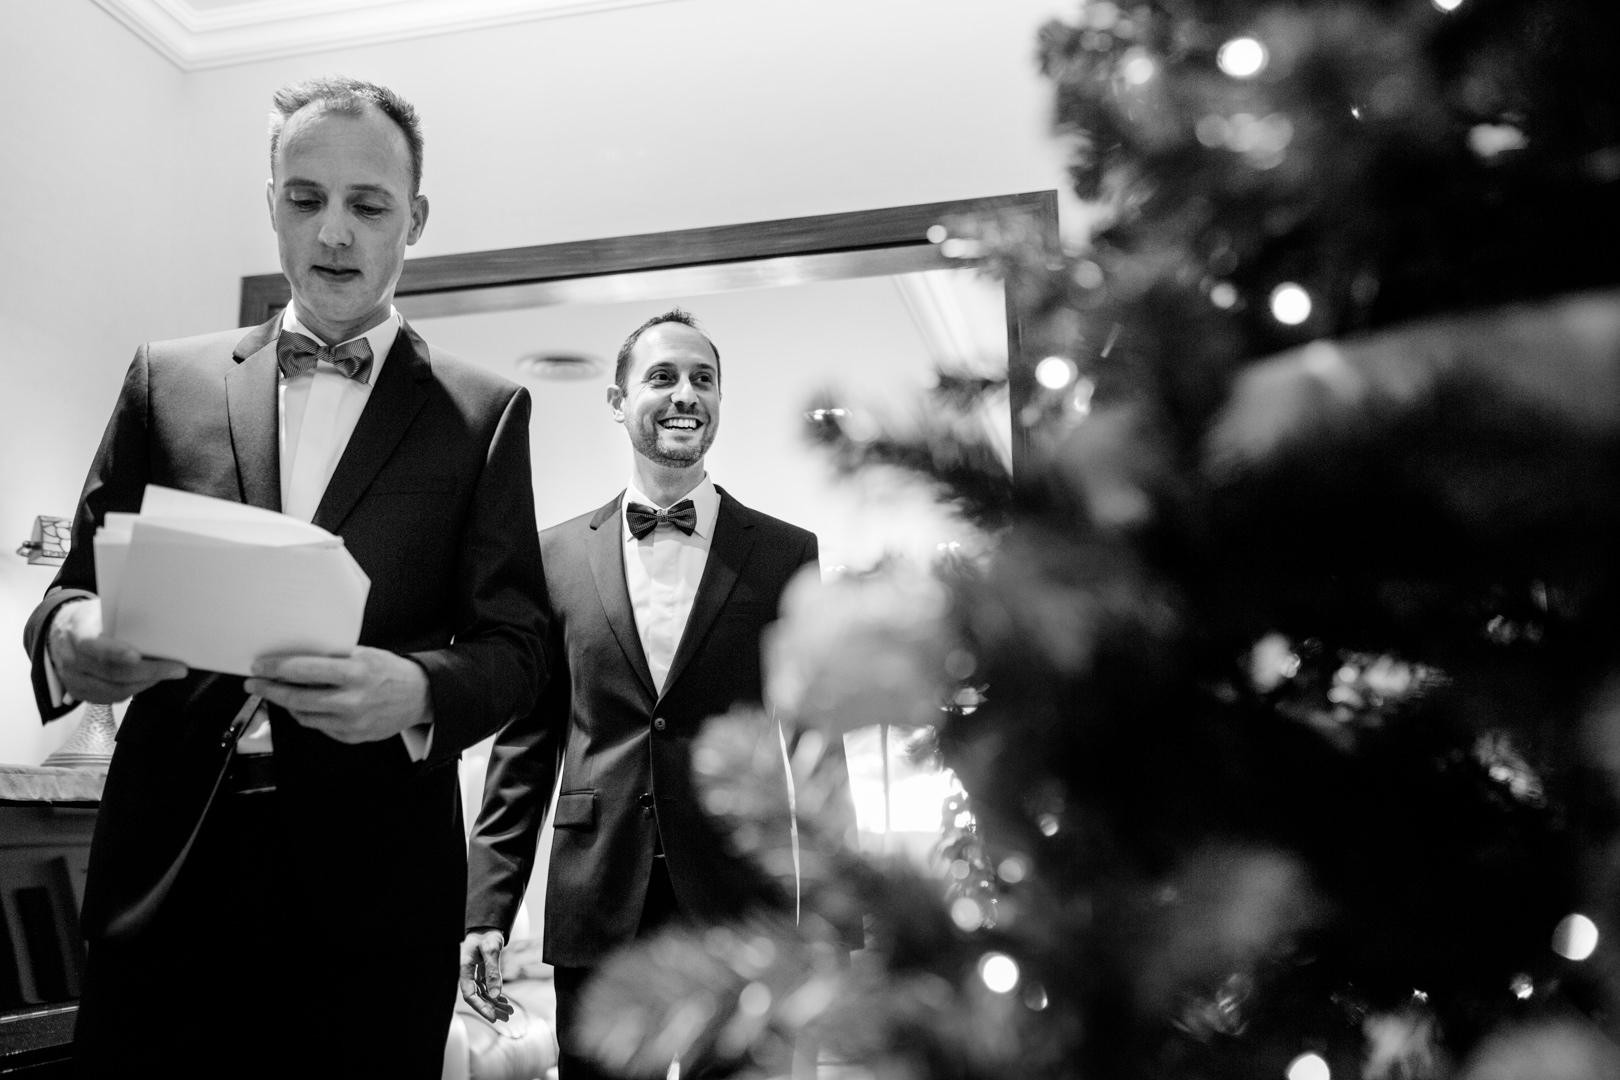 Same-sex-wedding-barcelona-boda- gay-samesex-engagement-Rafael-Torres-fotografo-bodas-sevilla-madrid-barcelona-wedding-photographer--7.jpg